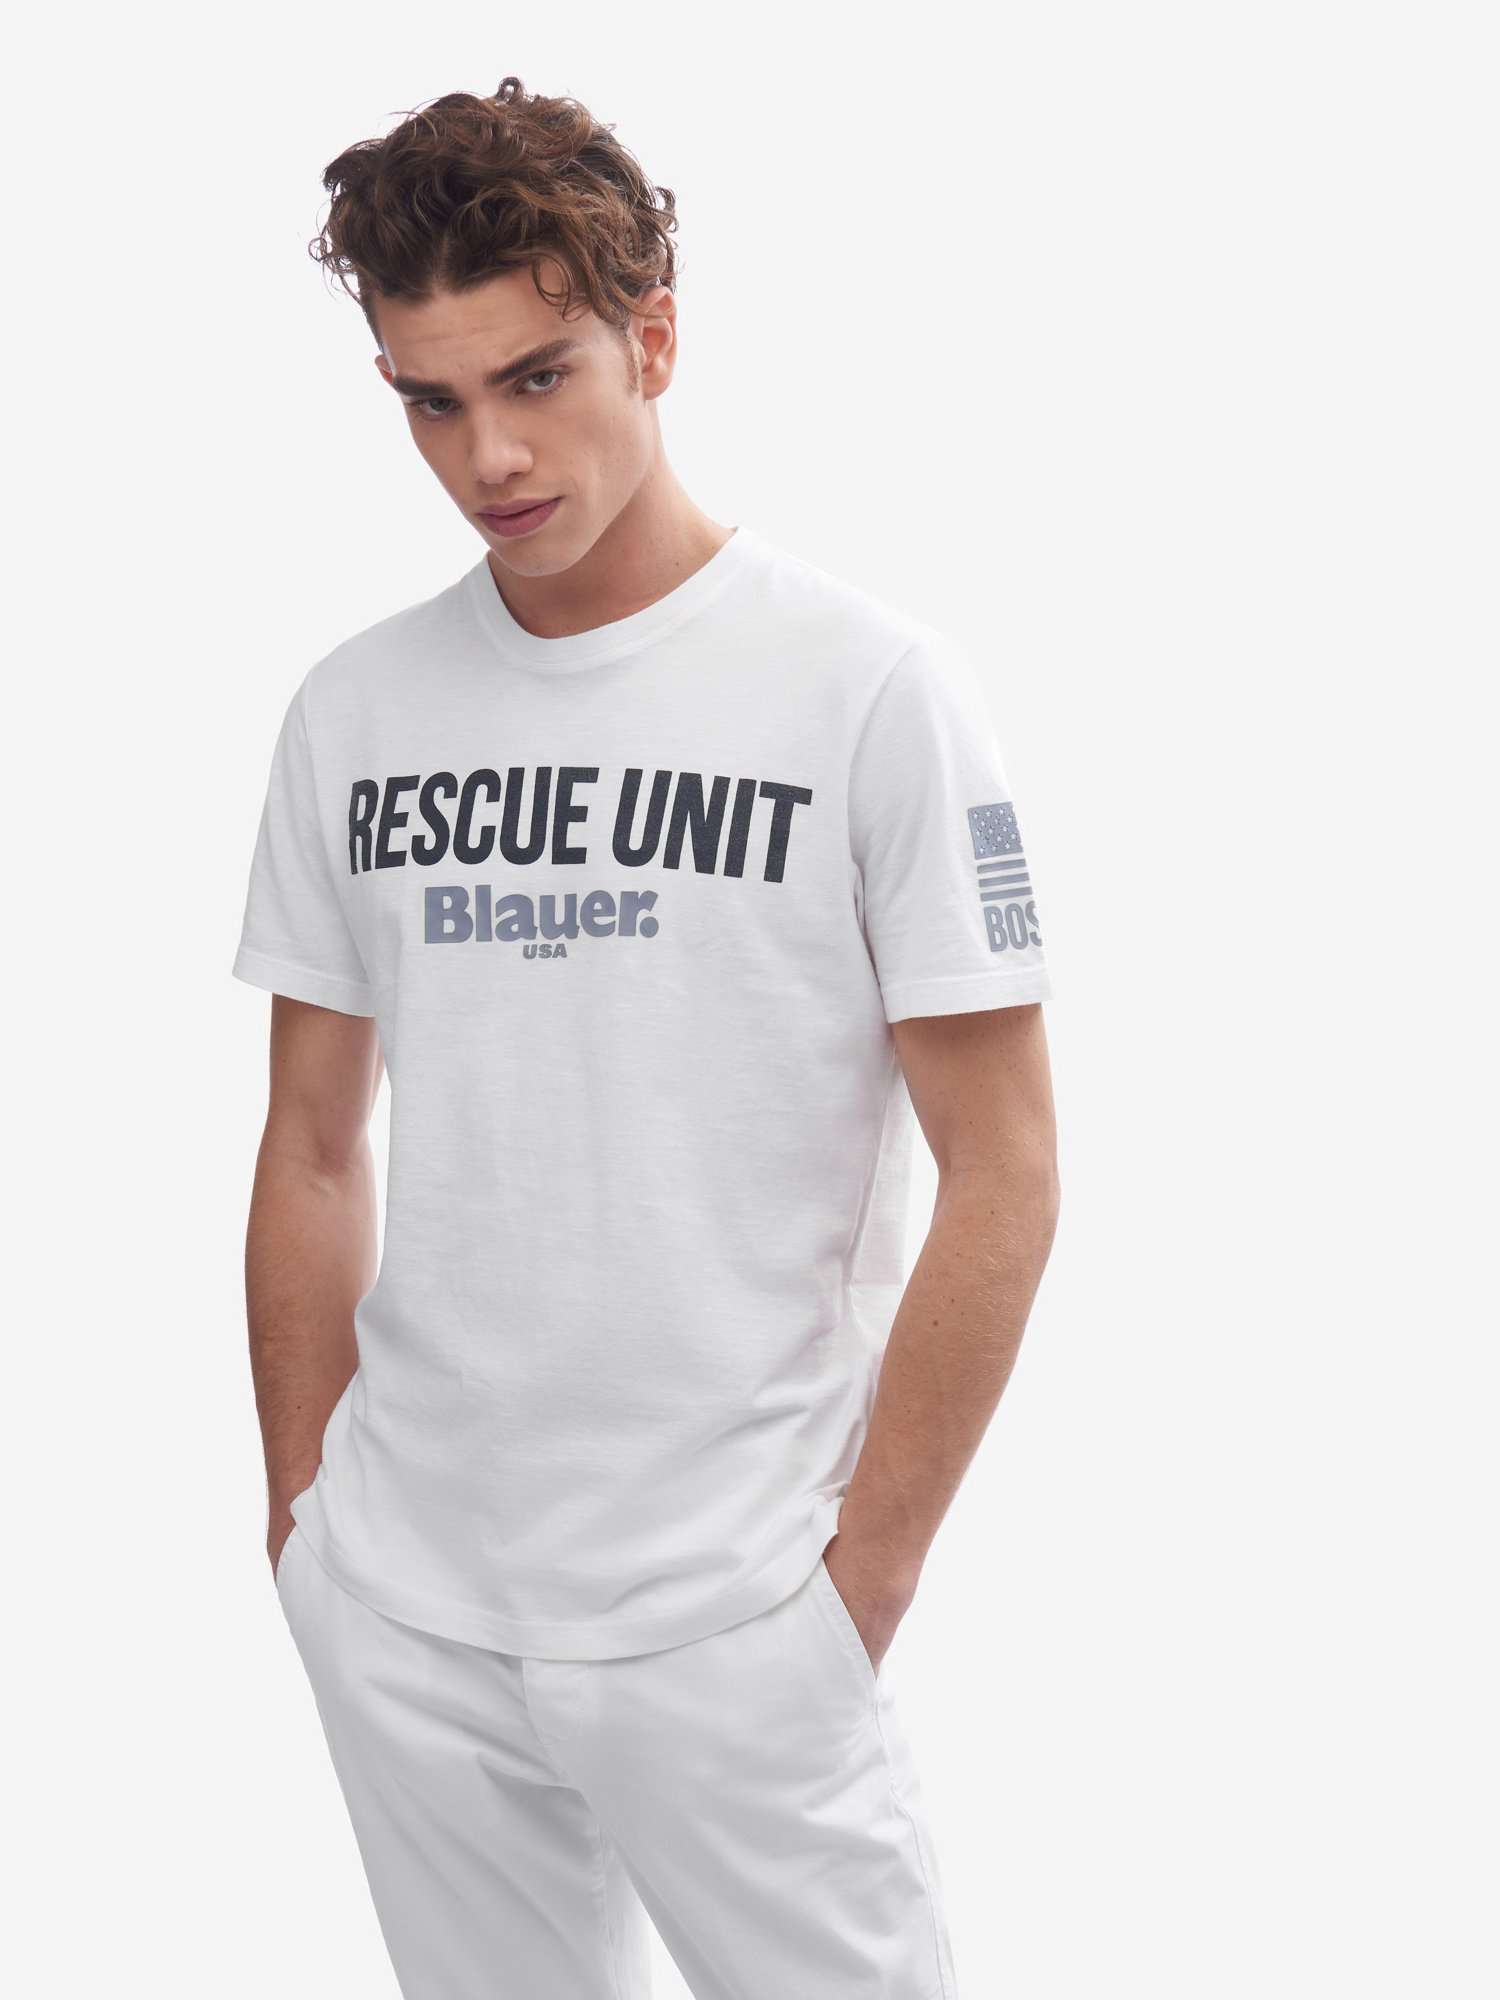 Blauer - RESCUE UNIT T-SHIRT - white - Blauer